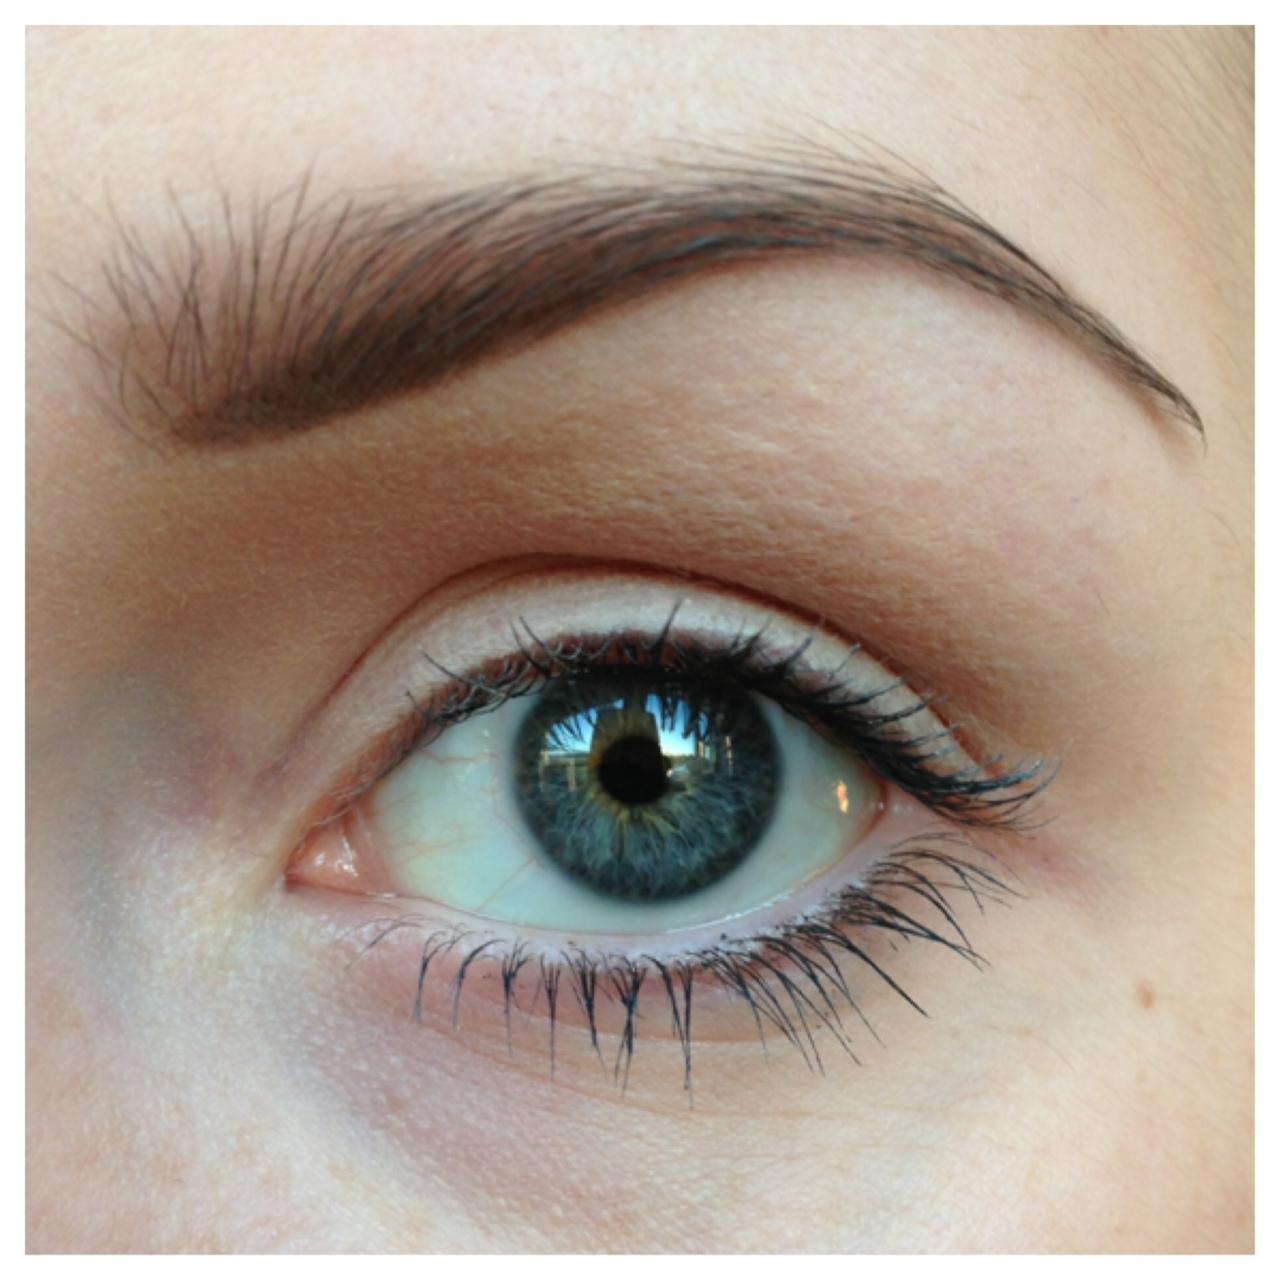 how to change my eyebrow shape